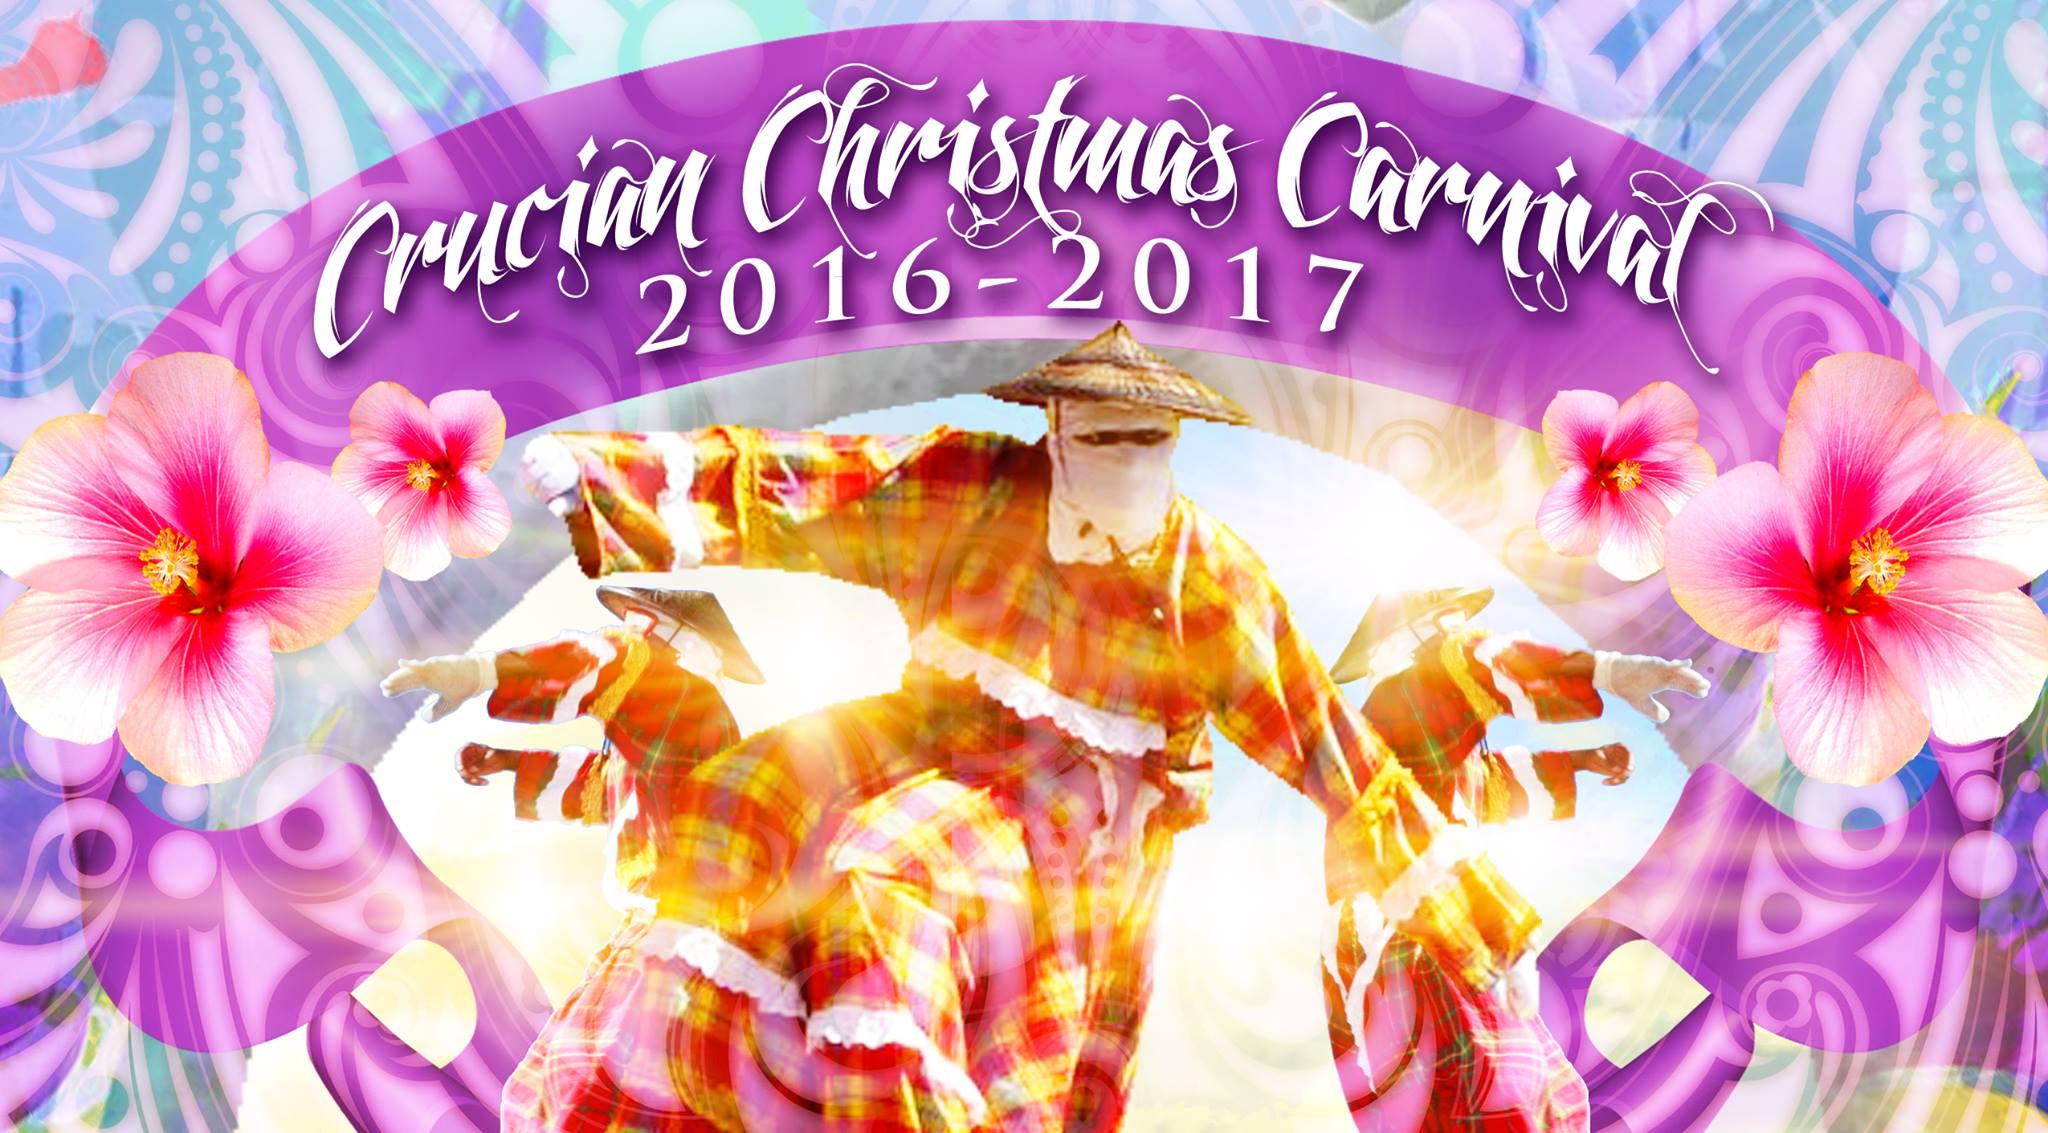 Island Christmas Theme.Crucian Christmas Carnival The Virgin Islands